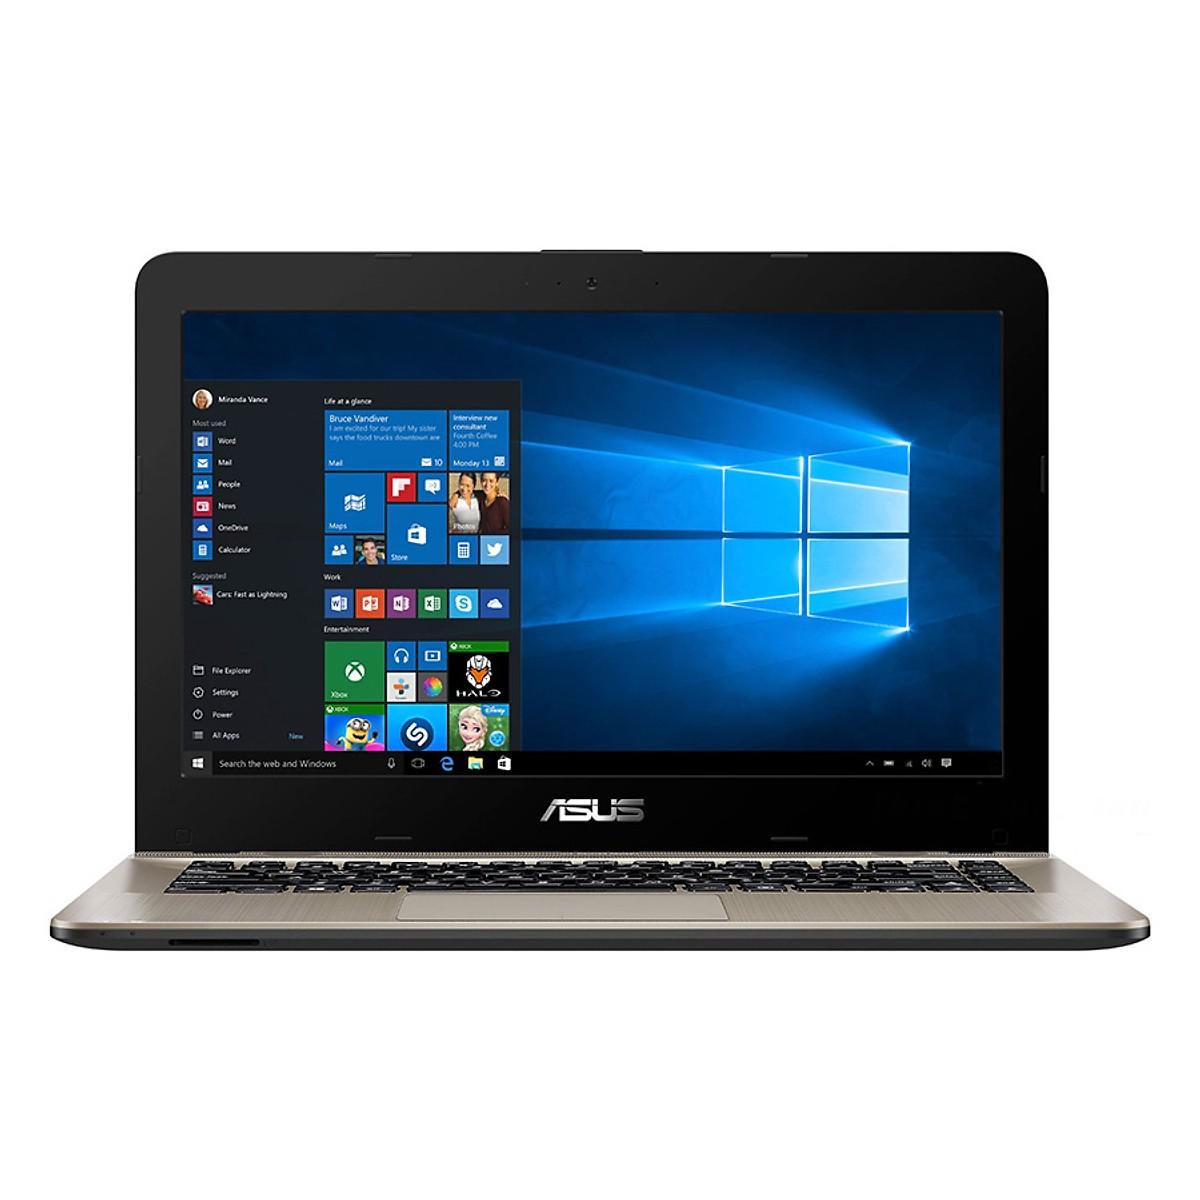 Laptop Asus X441UA-GA070 Core i3 - 7100U / Free DOS (14inch)